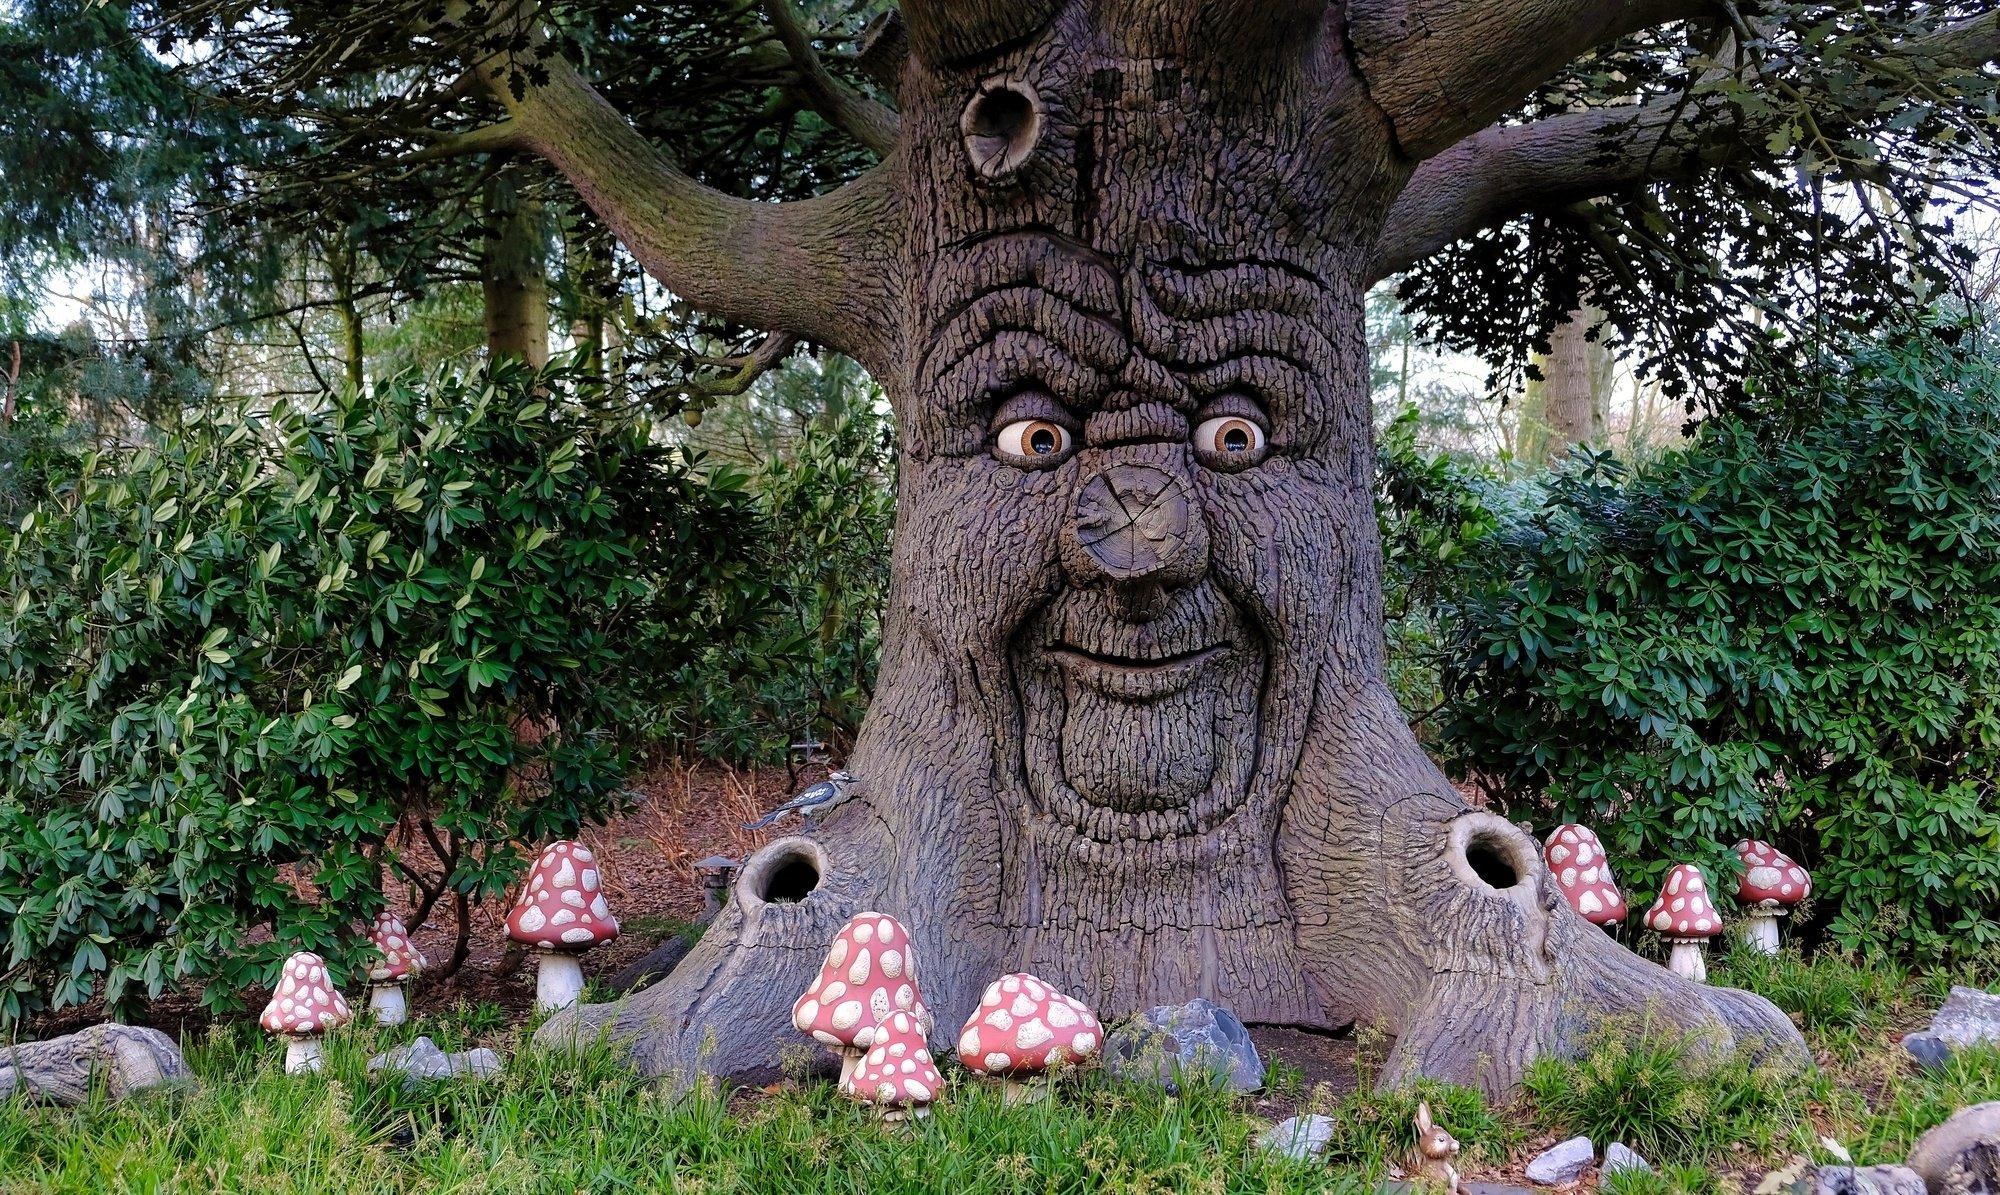 Talking tree at Efteling Amusement Park